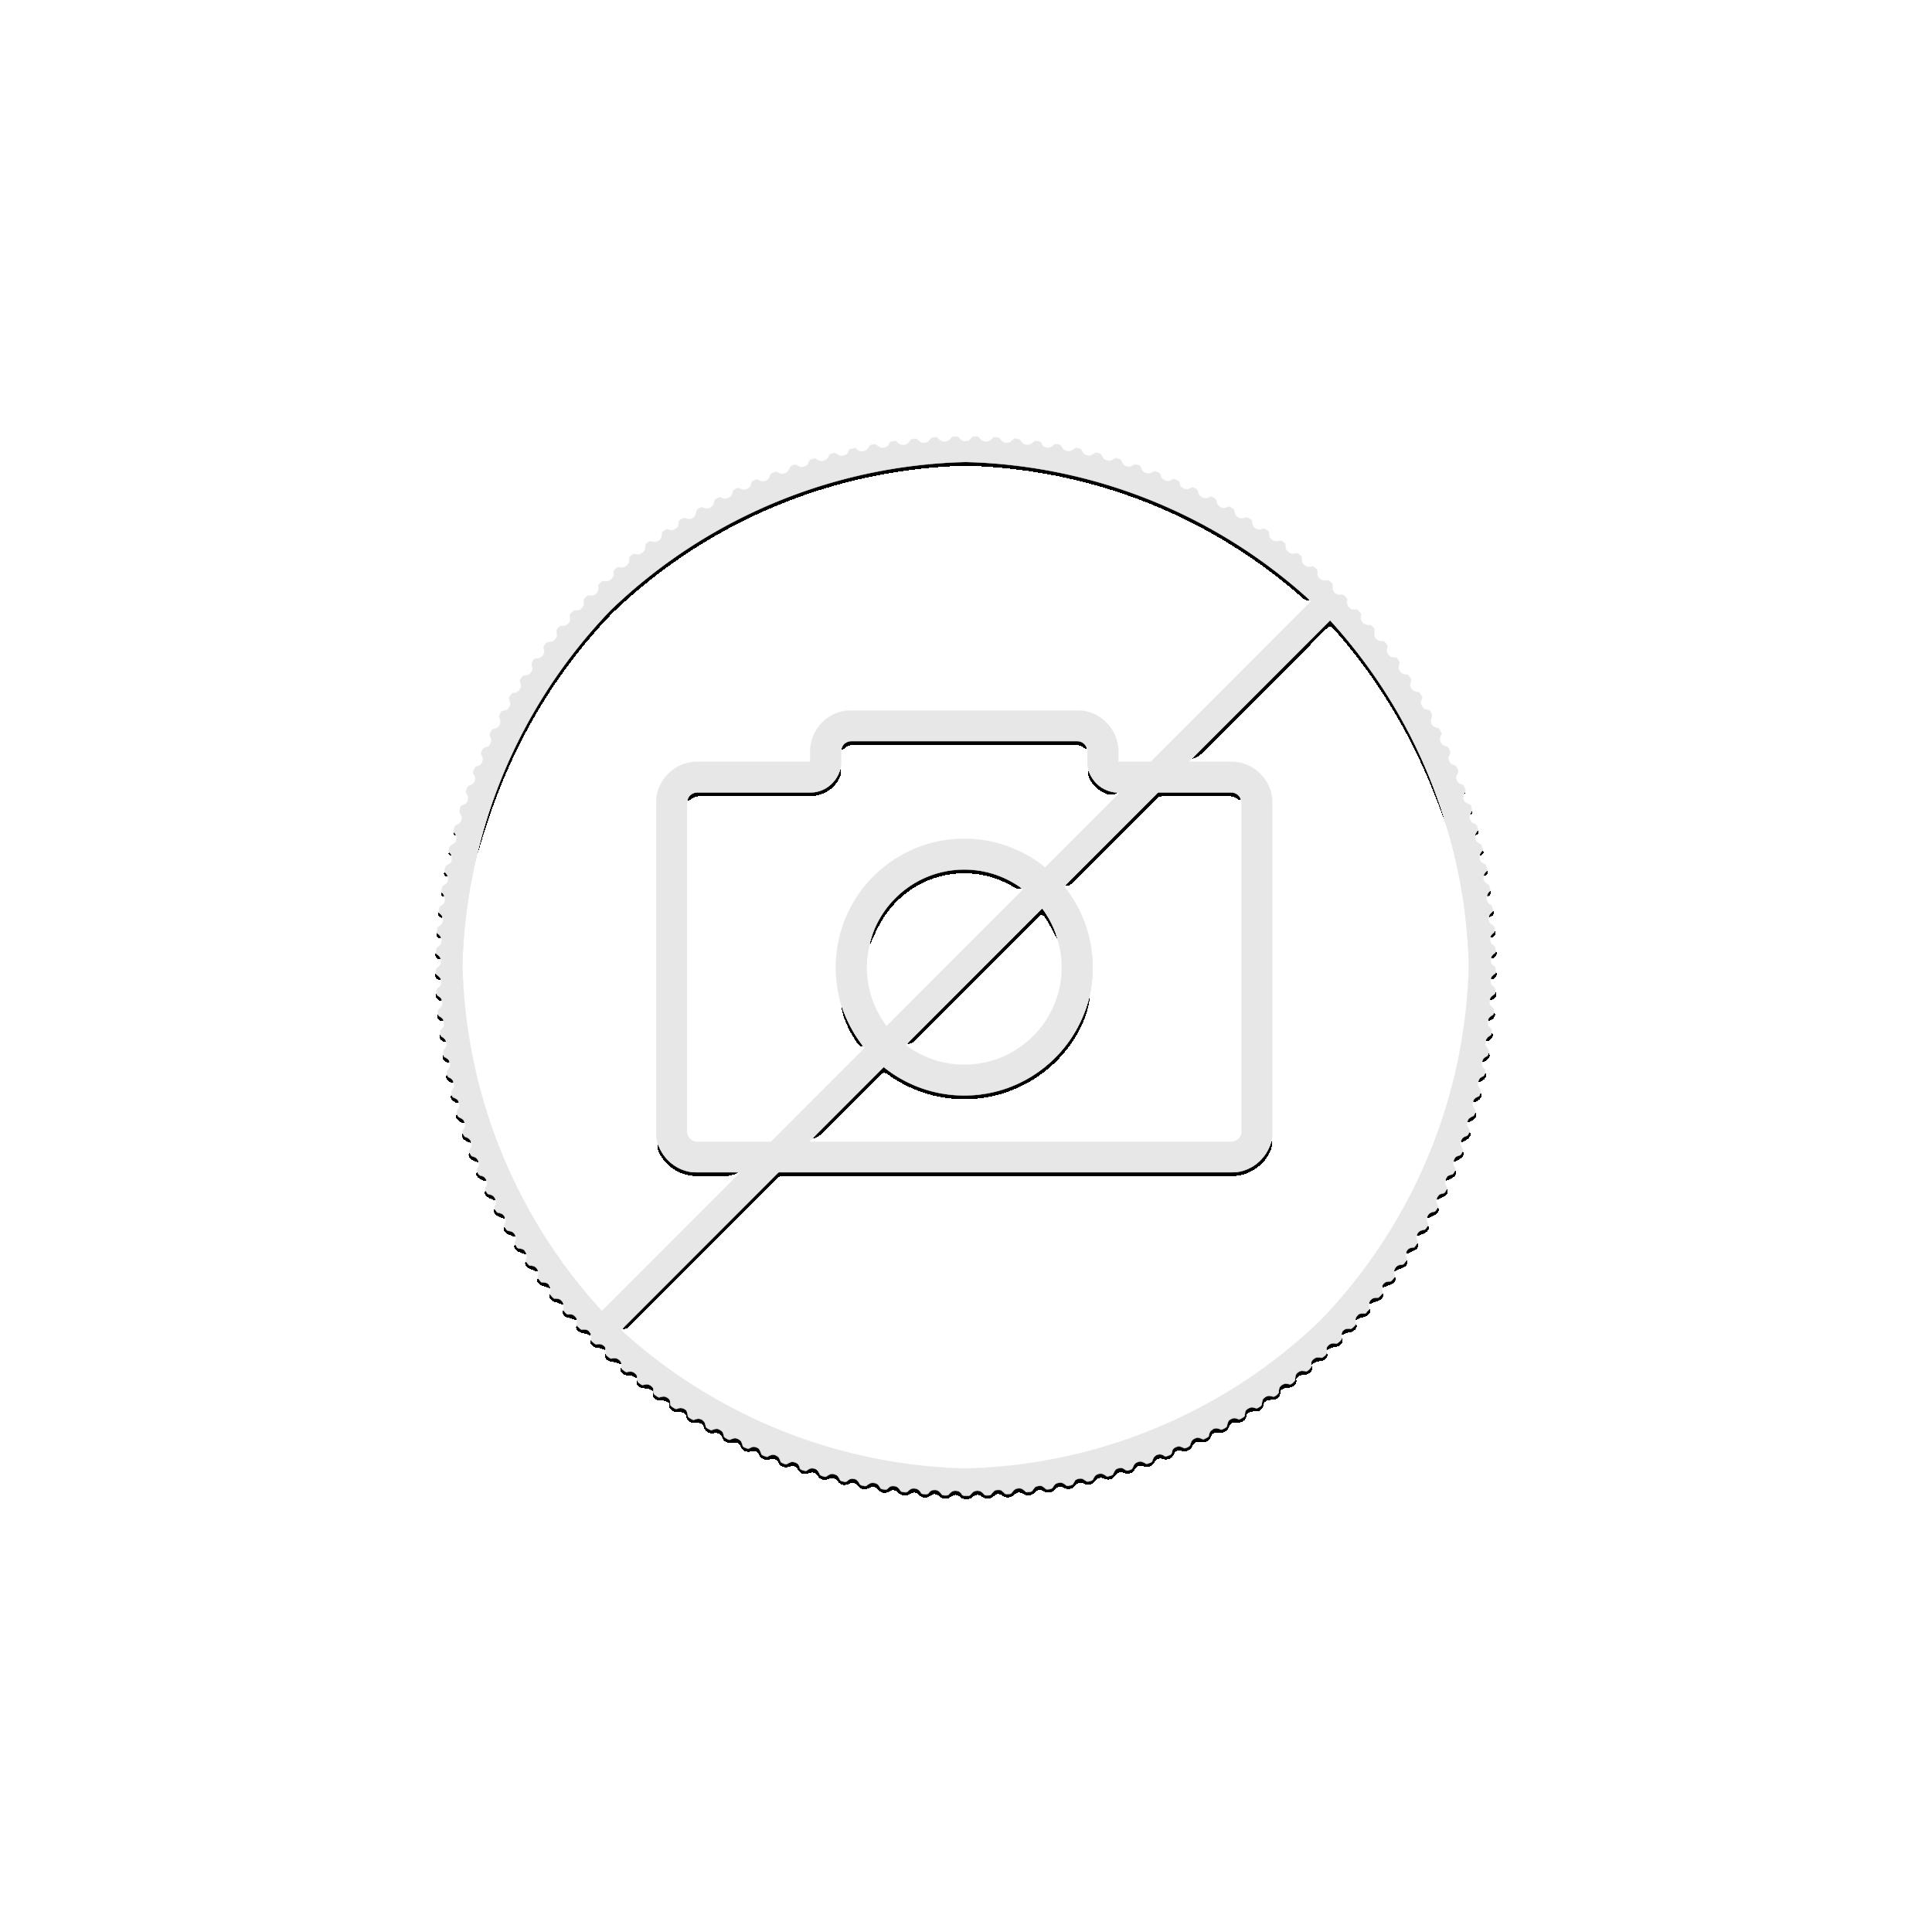 2 troy ounce zilveren munt Ruby Scarabeus 2021